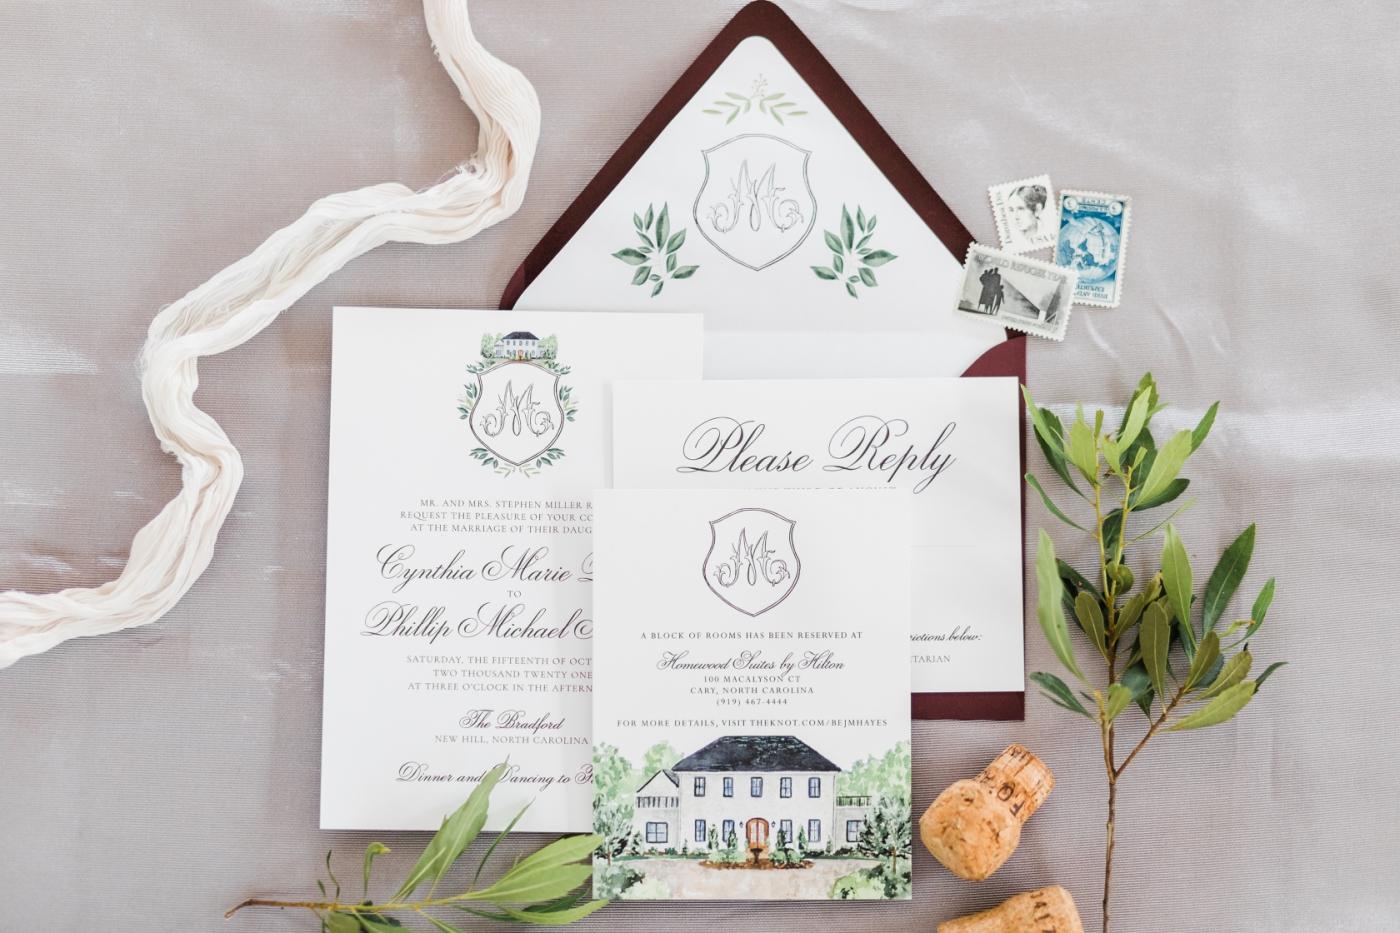 Wedding invitation budget breakdown